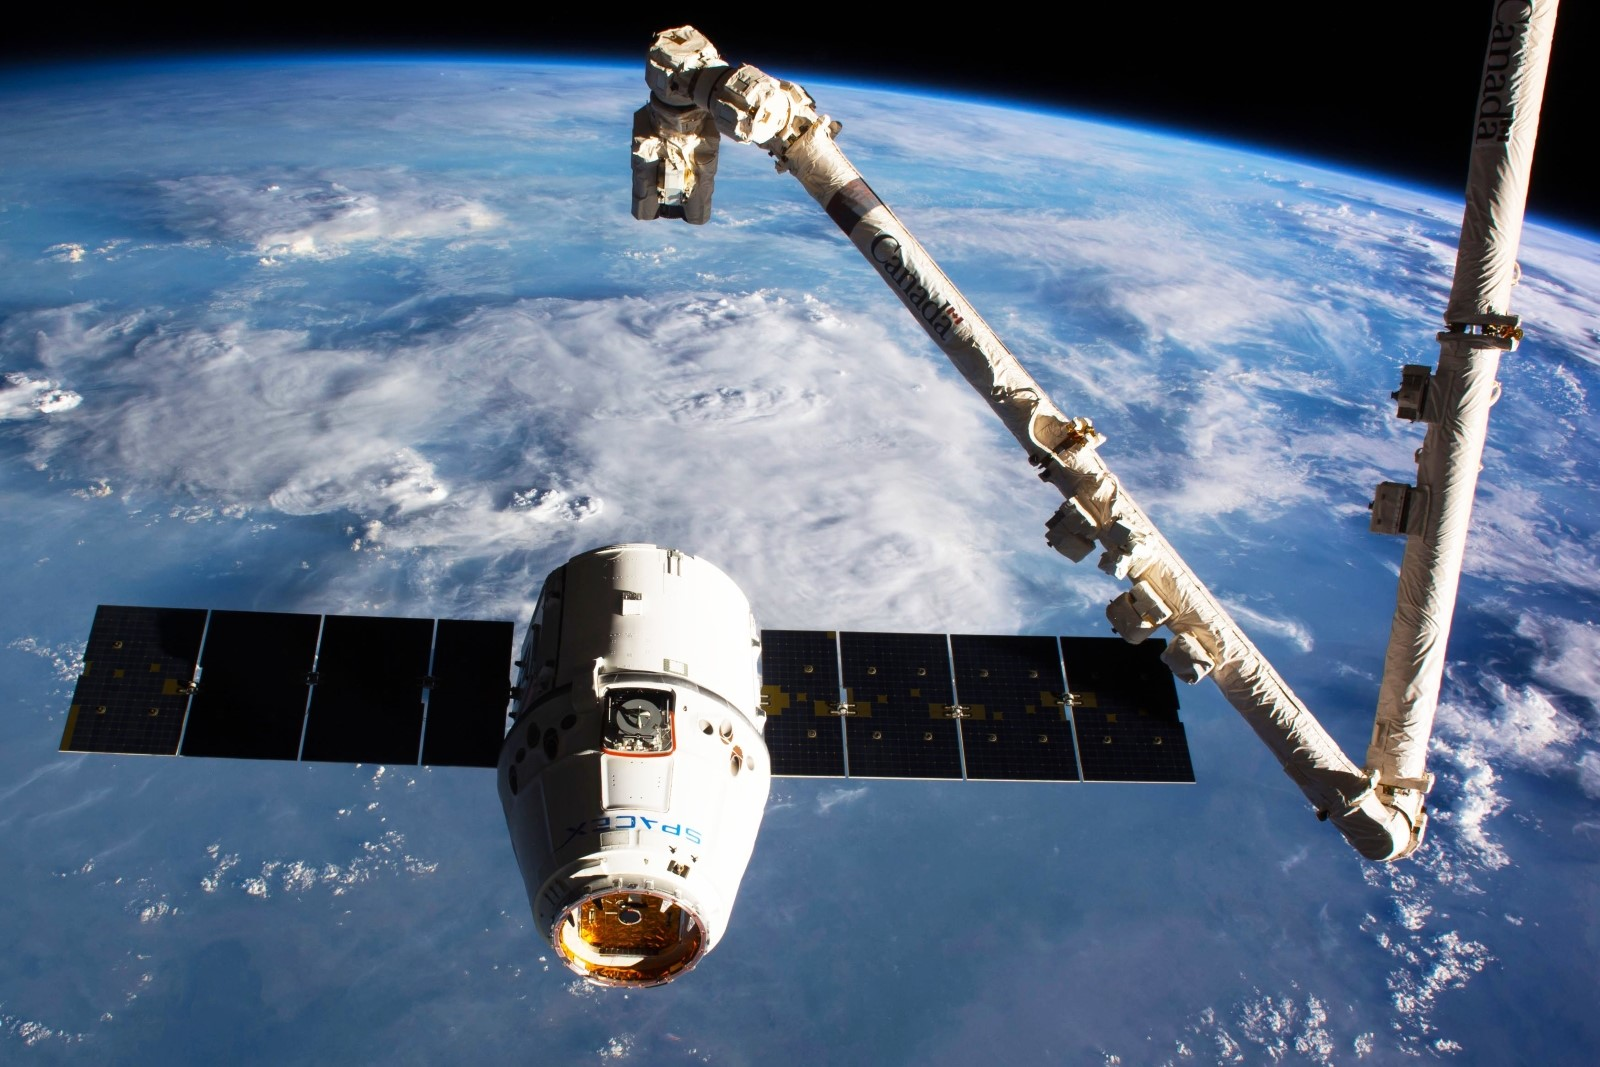 spacex falcon v1.1 vandenberg arrives - photo #34